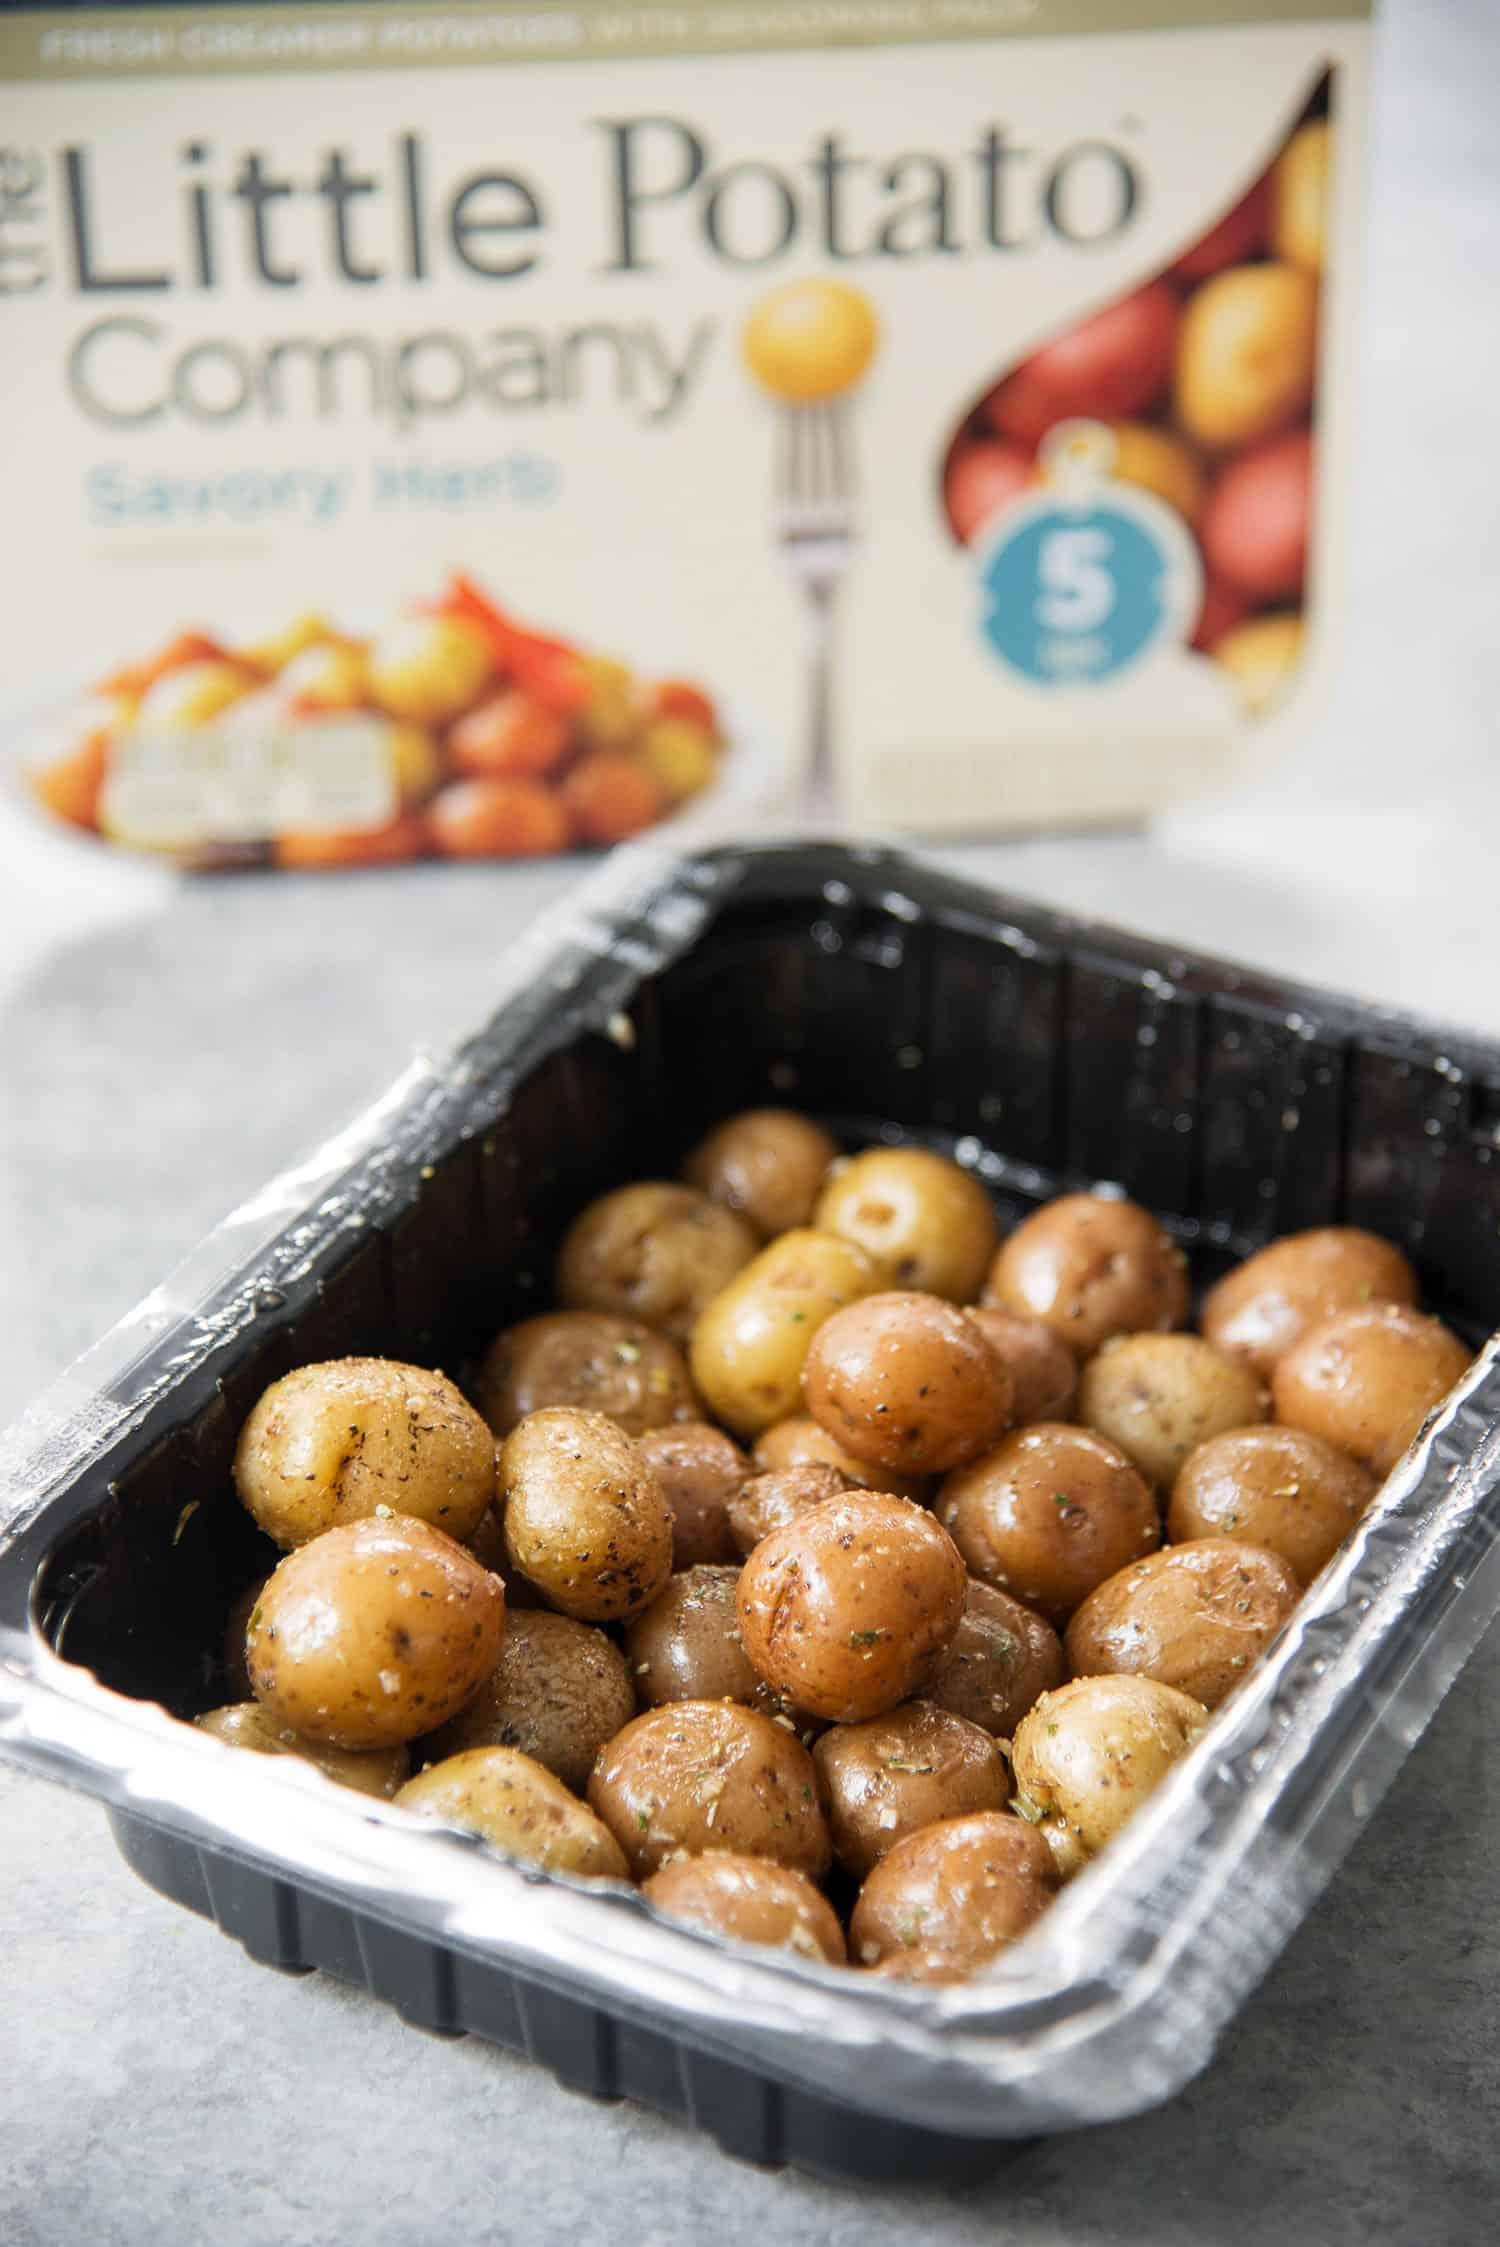 These Little Potato Company microwaveable potatoes make this recipe a breeze